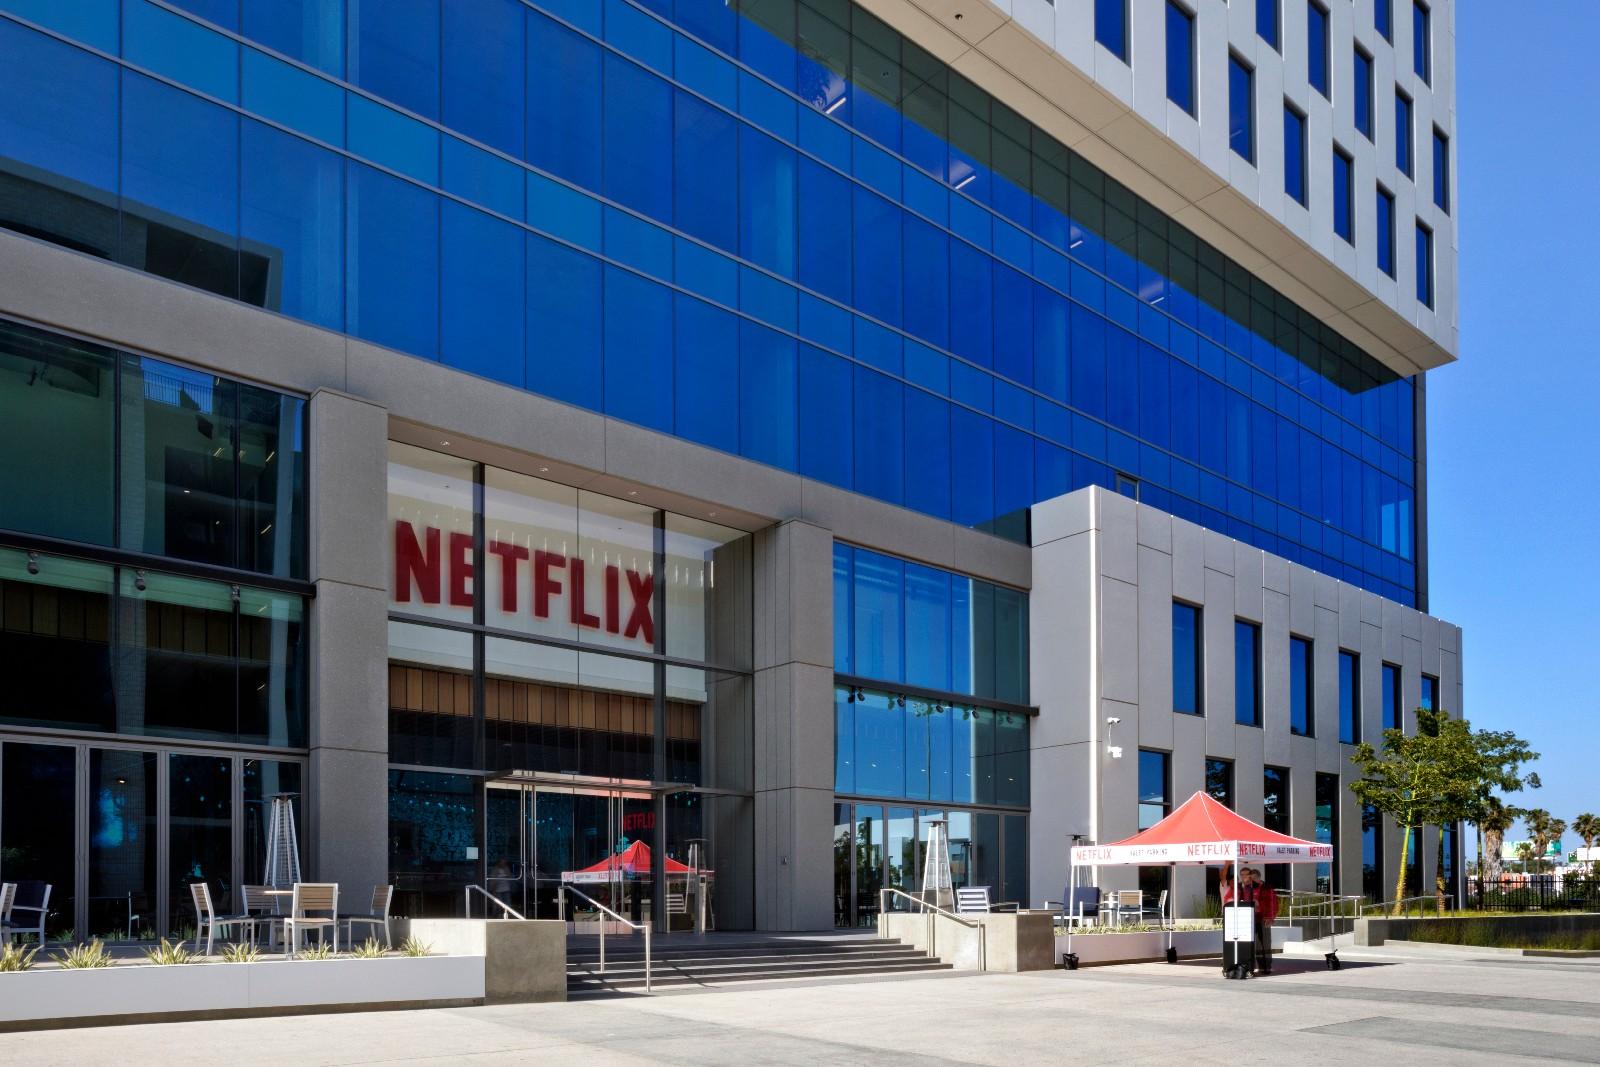 Netflix pledges $100 million to improve the diversity in its shows